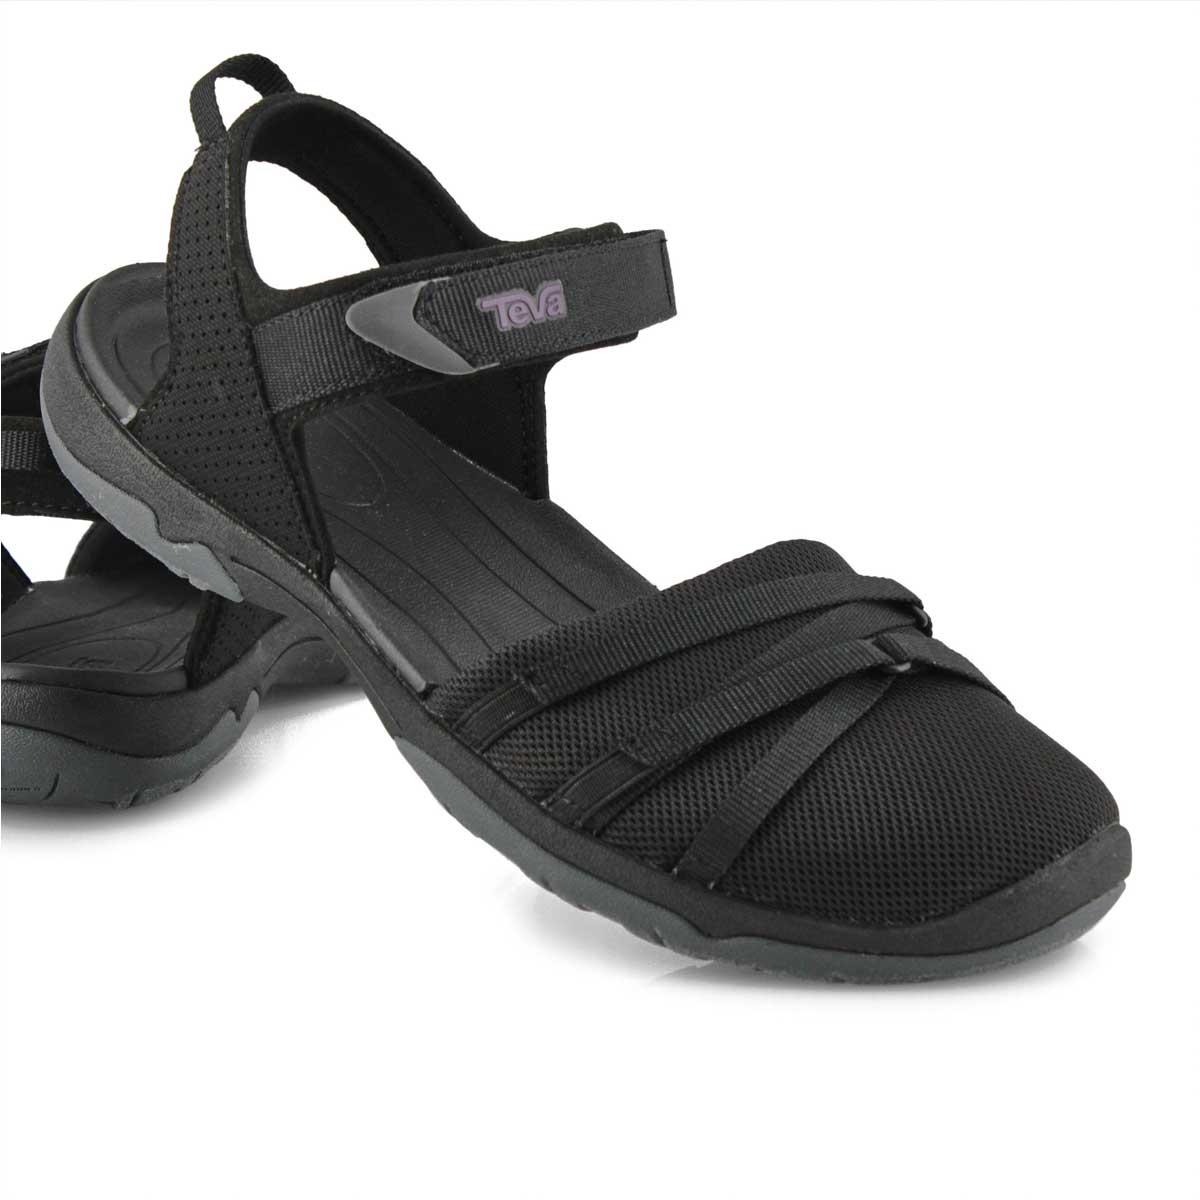 Lds Tirra CT black sport sandal